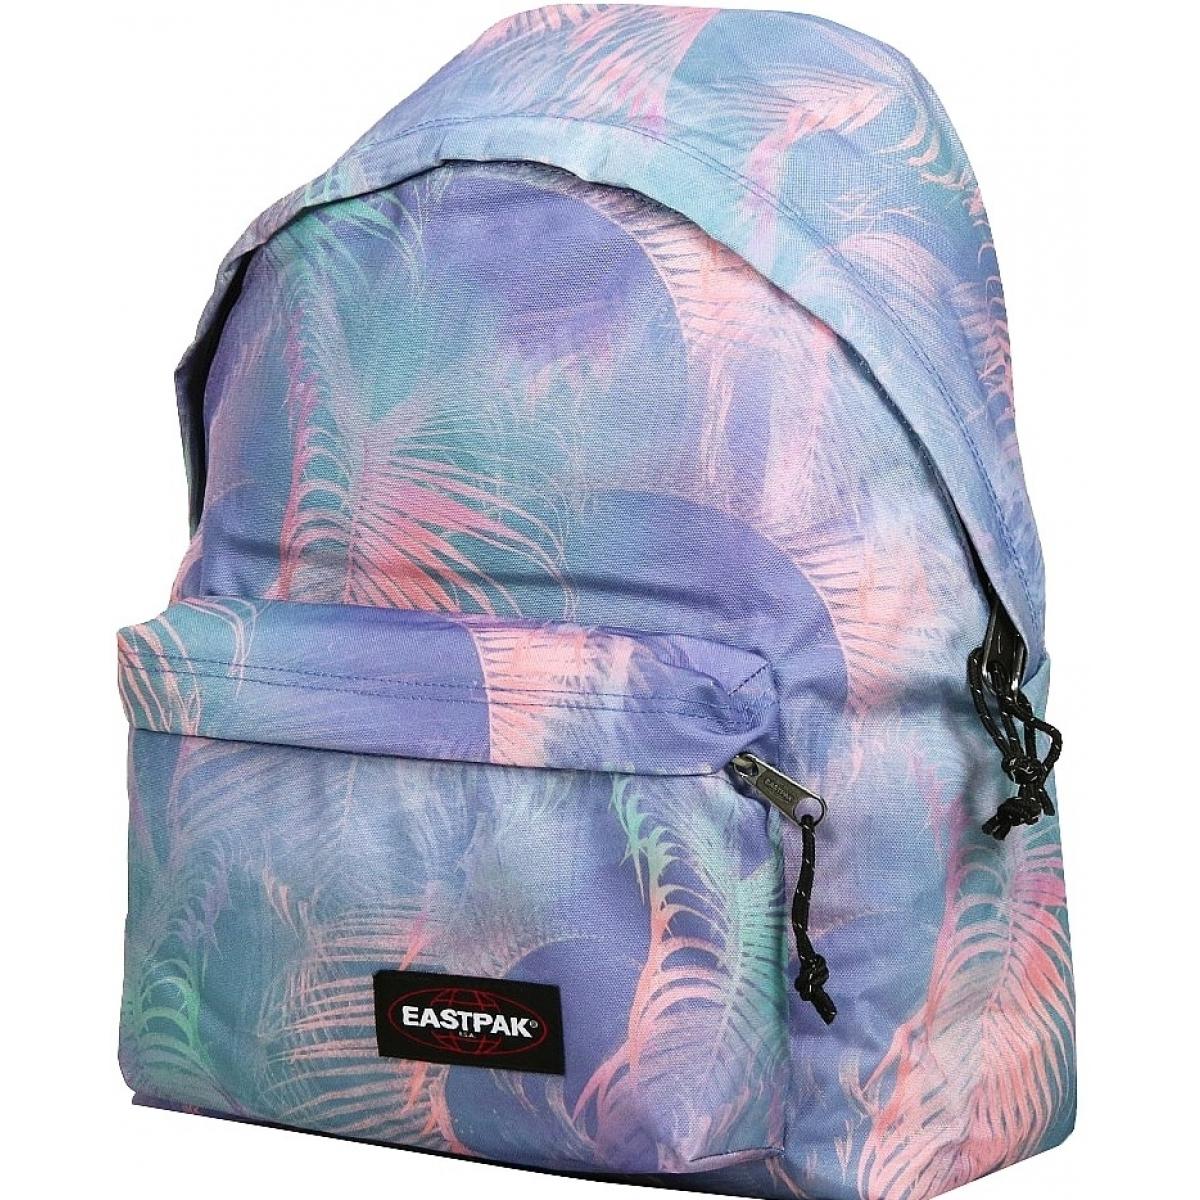 sac dos scolaire eastpak ek620 brize blush ek62087r couleur principale assortis. Black Bedroom Furniture Sets. Home Design Ideas